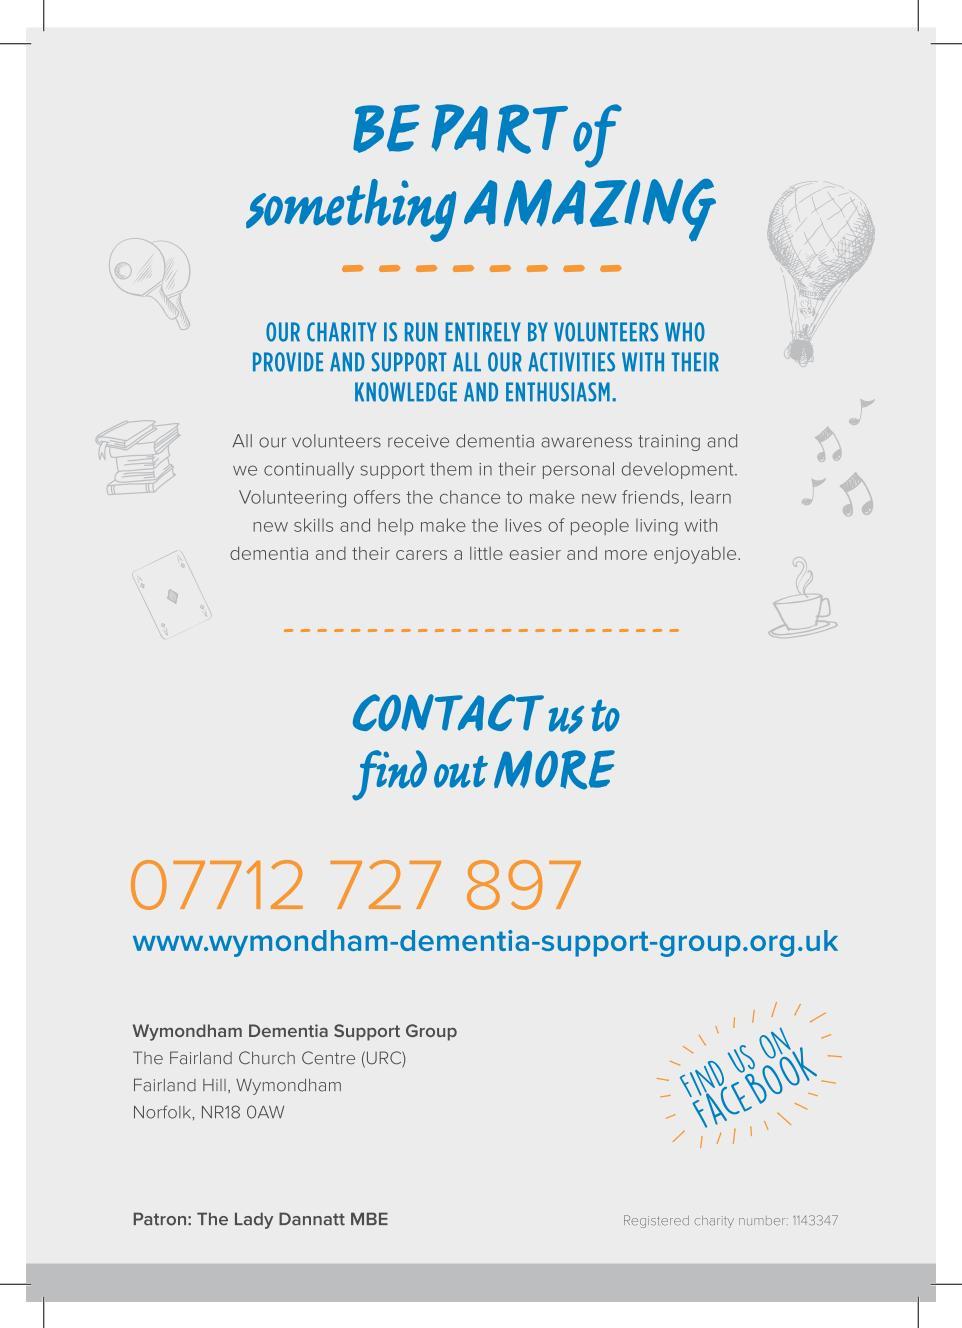 Wymondham Dementia Support Group Information Leaflet - Page 4